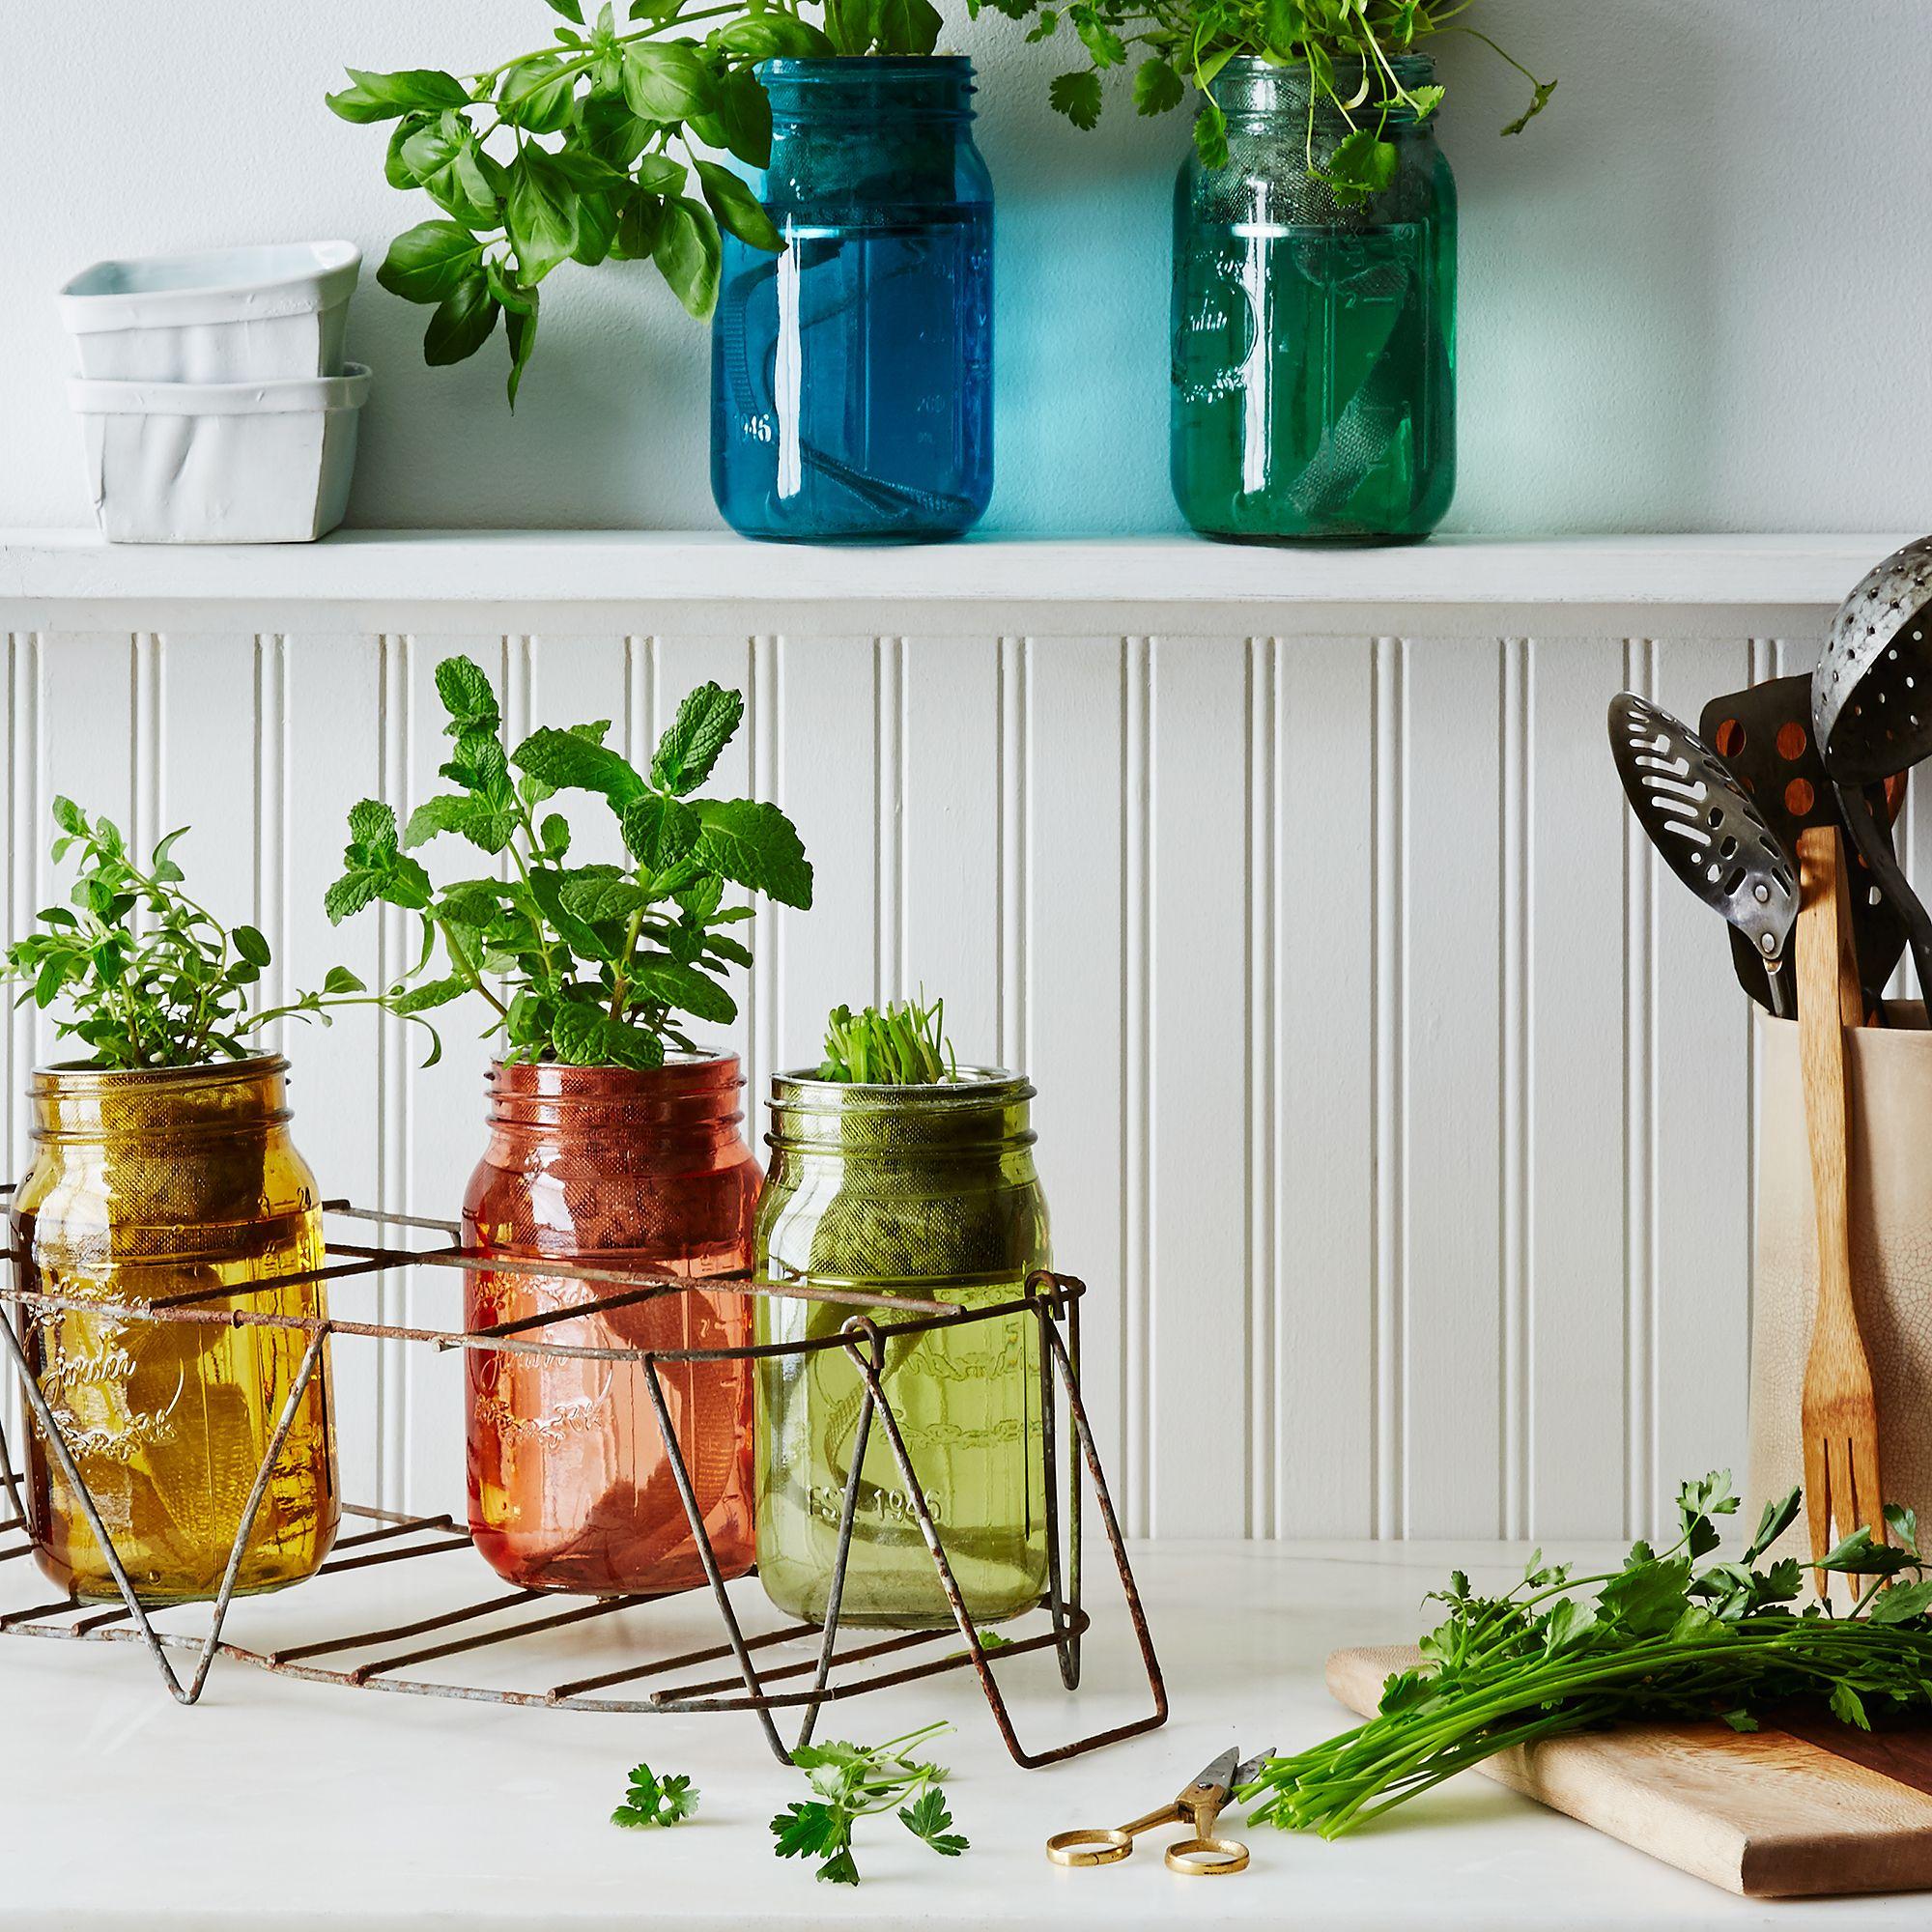 Garden Jar Herb Kit on Food52